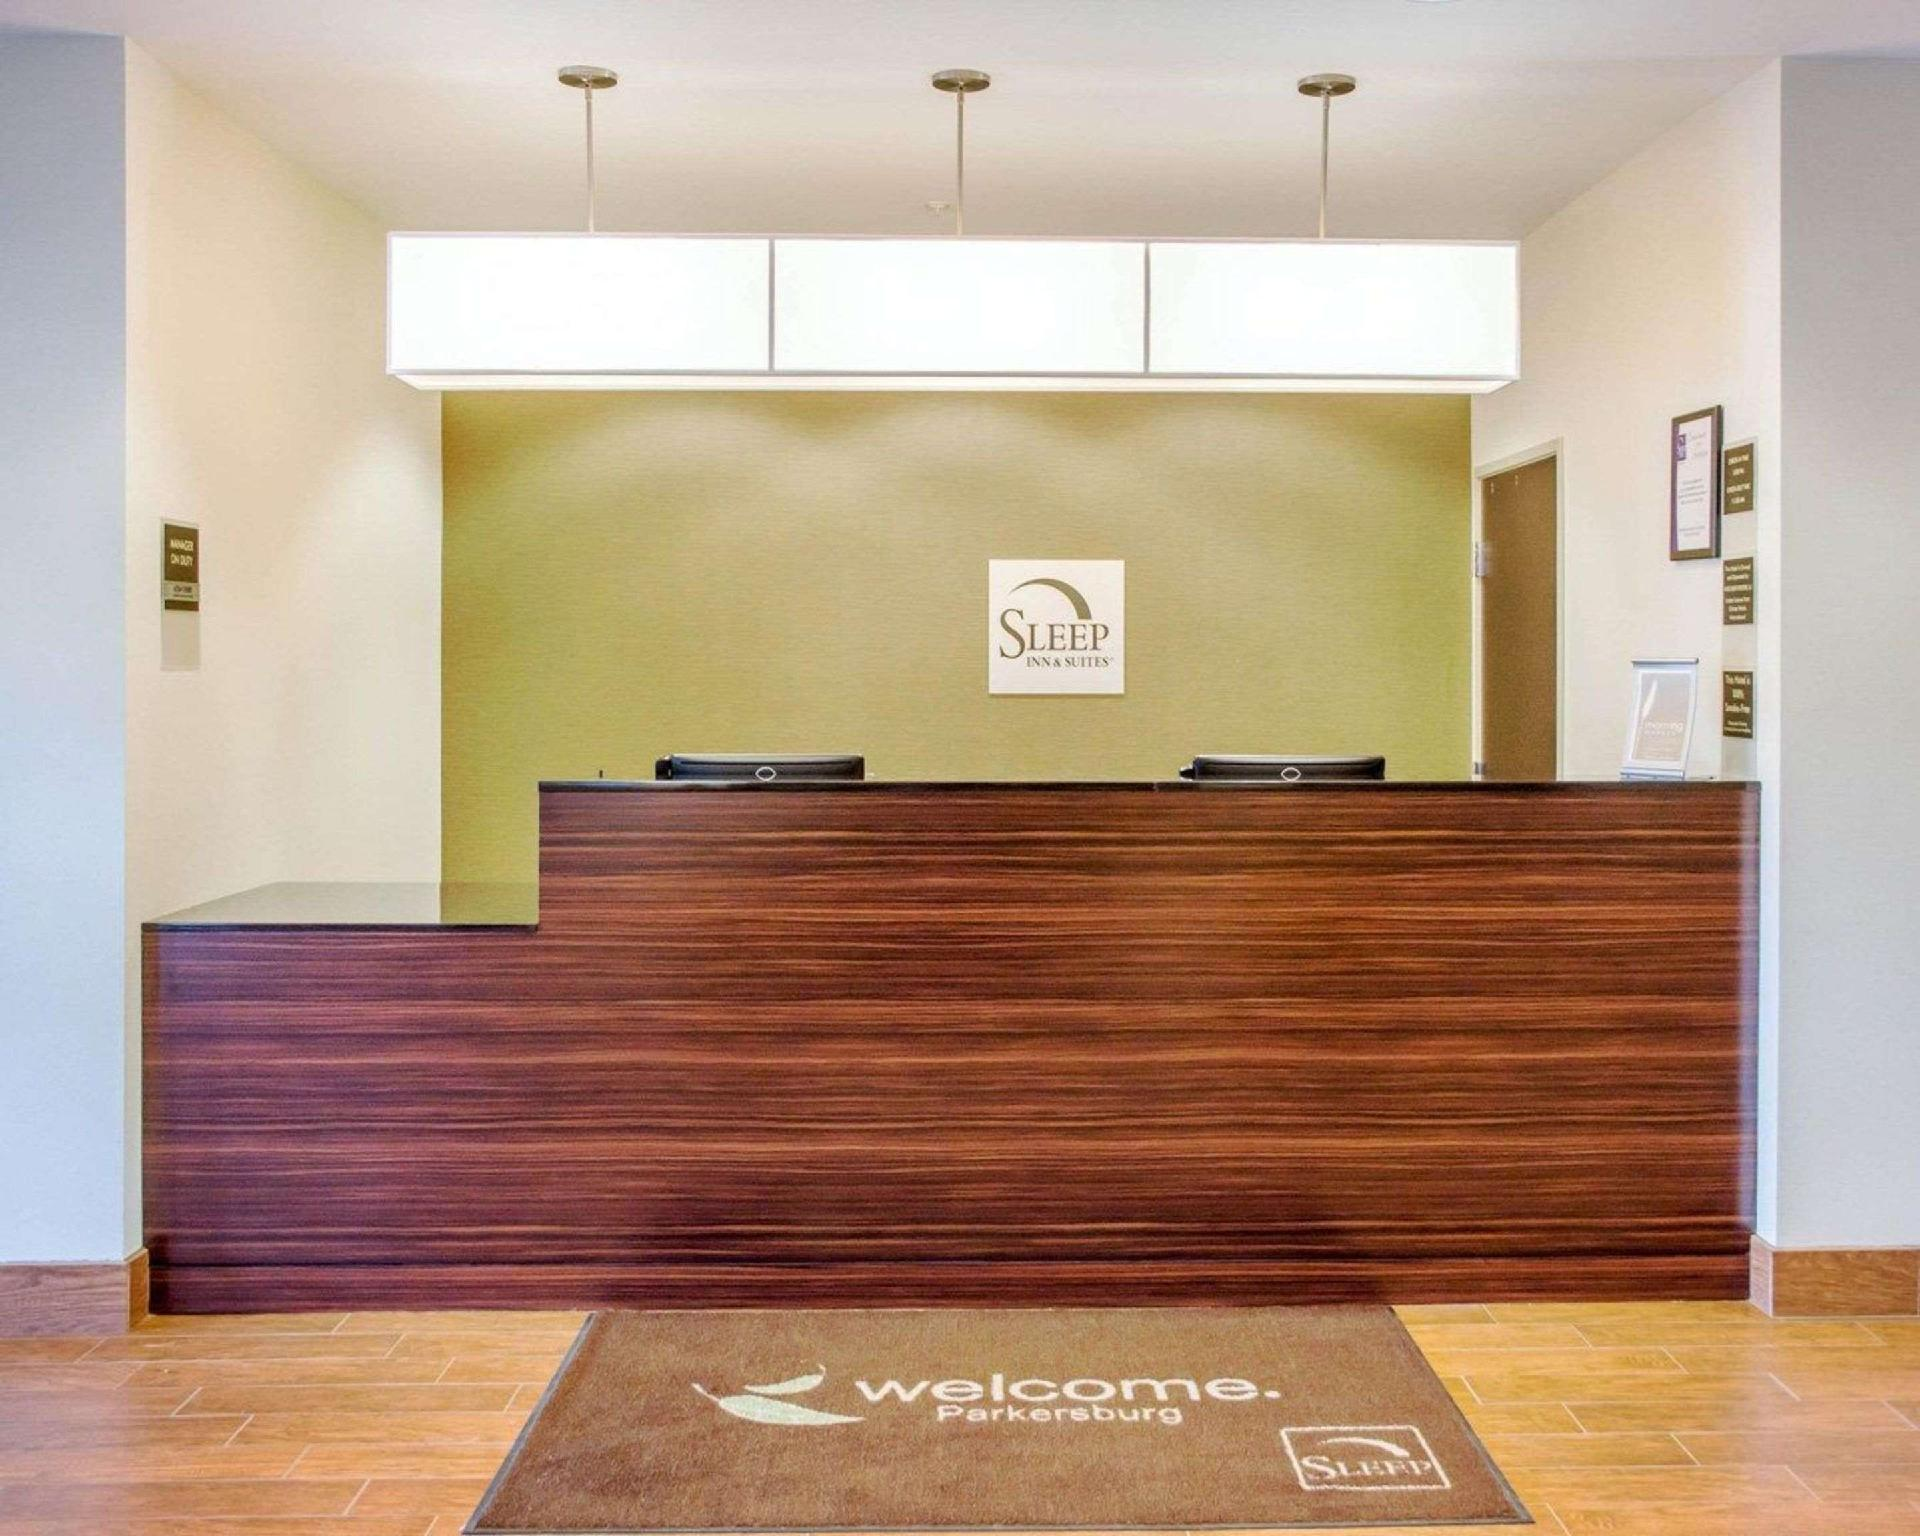 Sleep Inn And Suites Parkersburg Marietta North Hills Wv